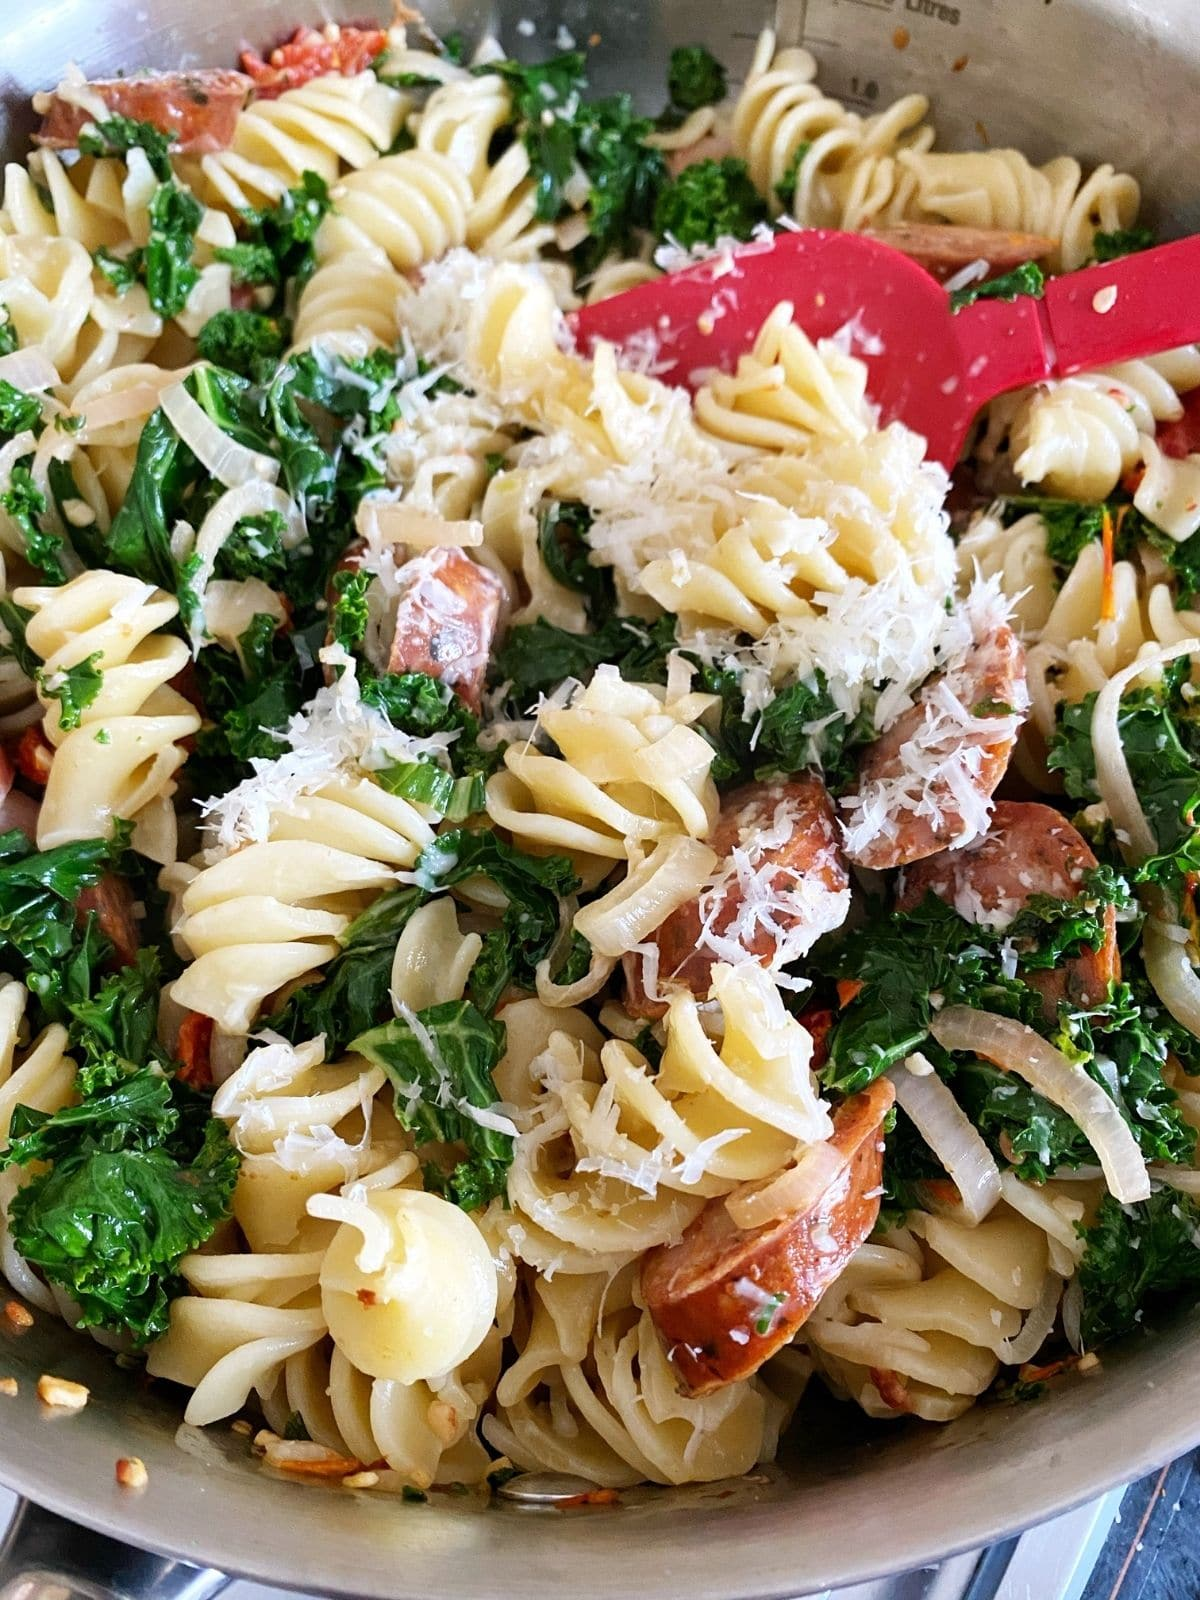 skillet of pasta with parmesan sprinkle on top